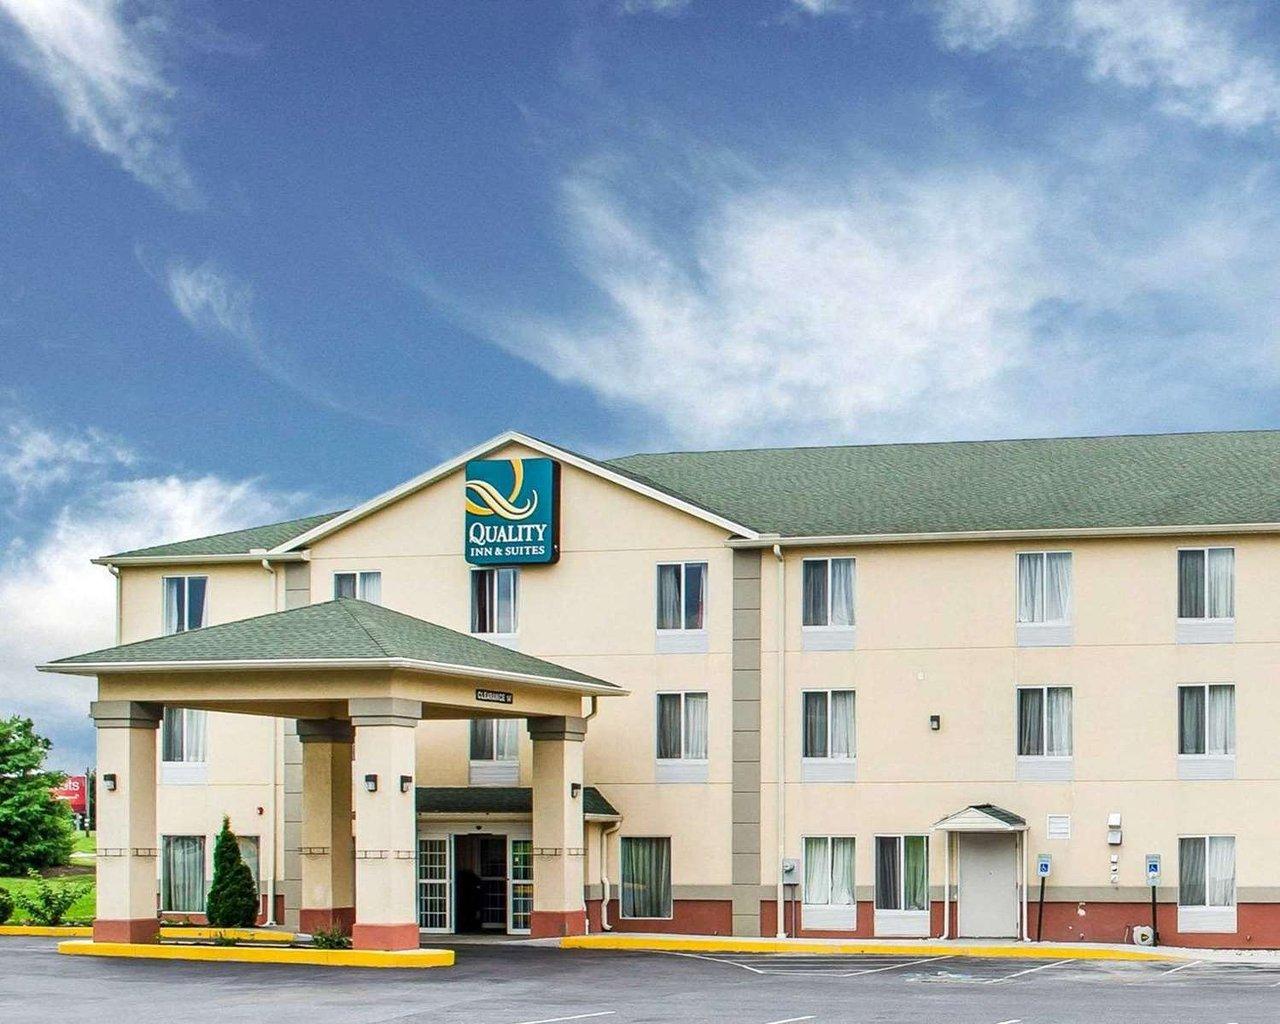 quality inn suites hershey 68 1 1 8 updated 2019 prices rh tripadvisor com